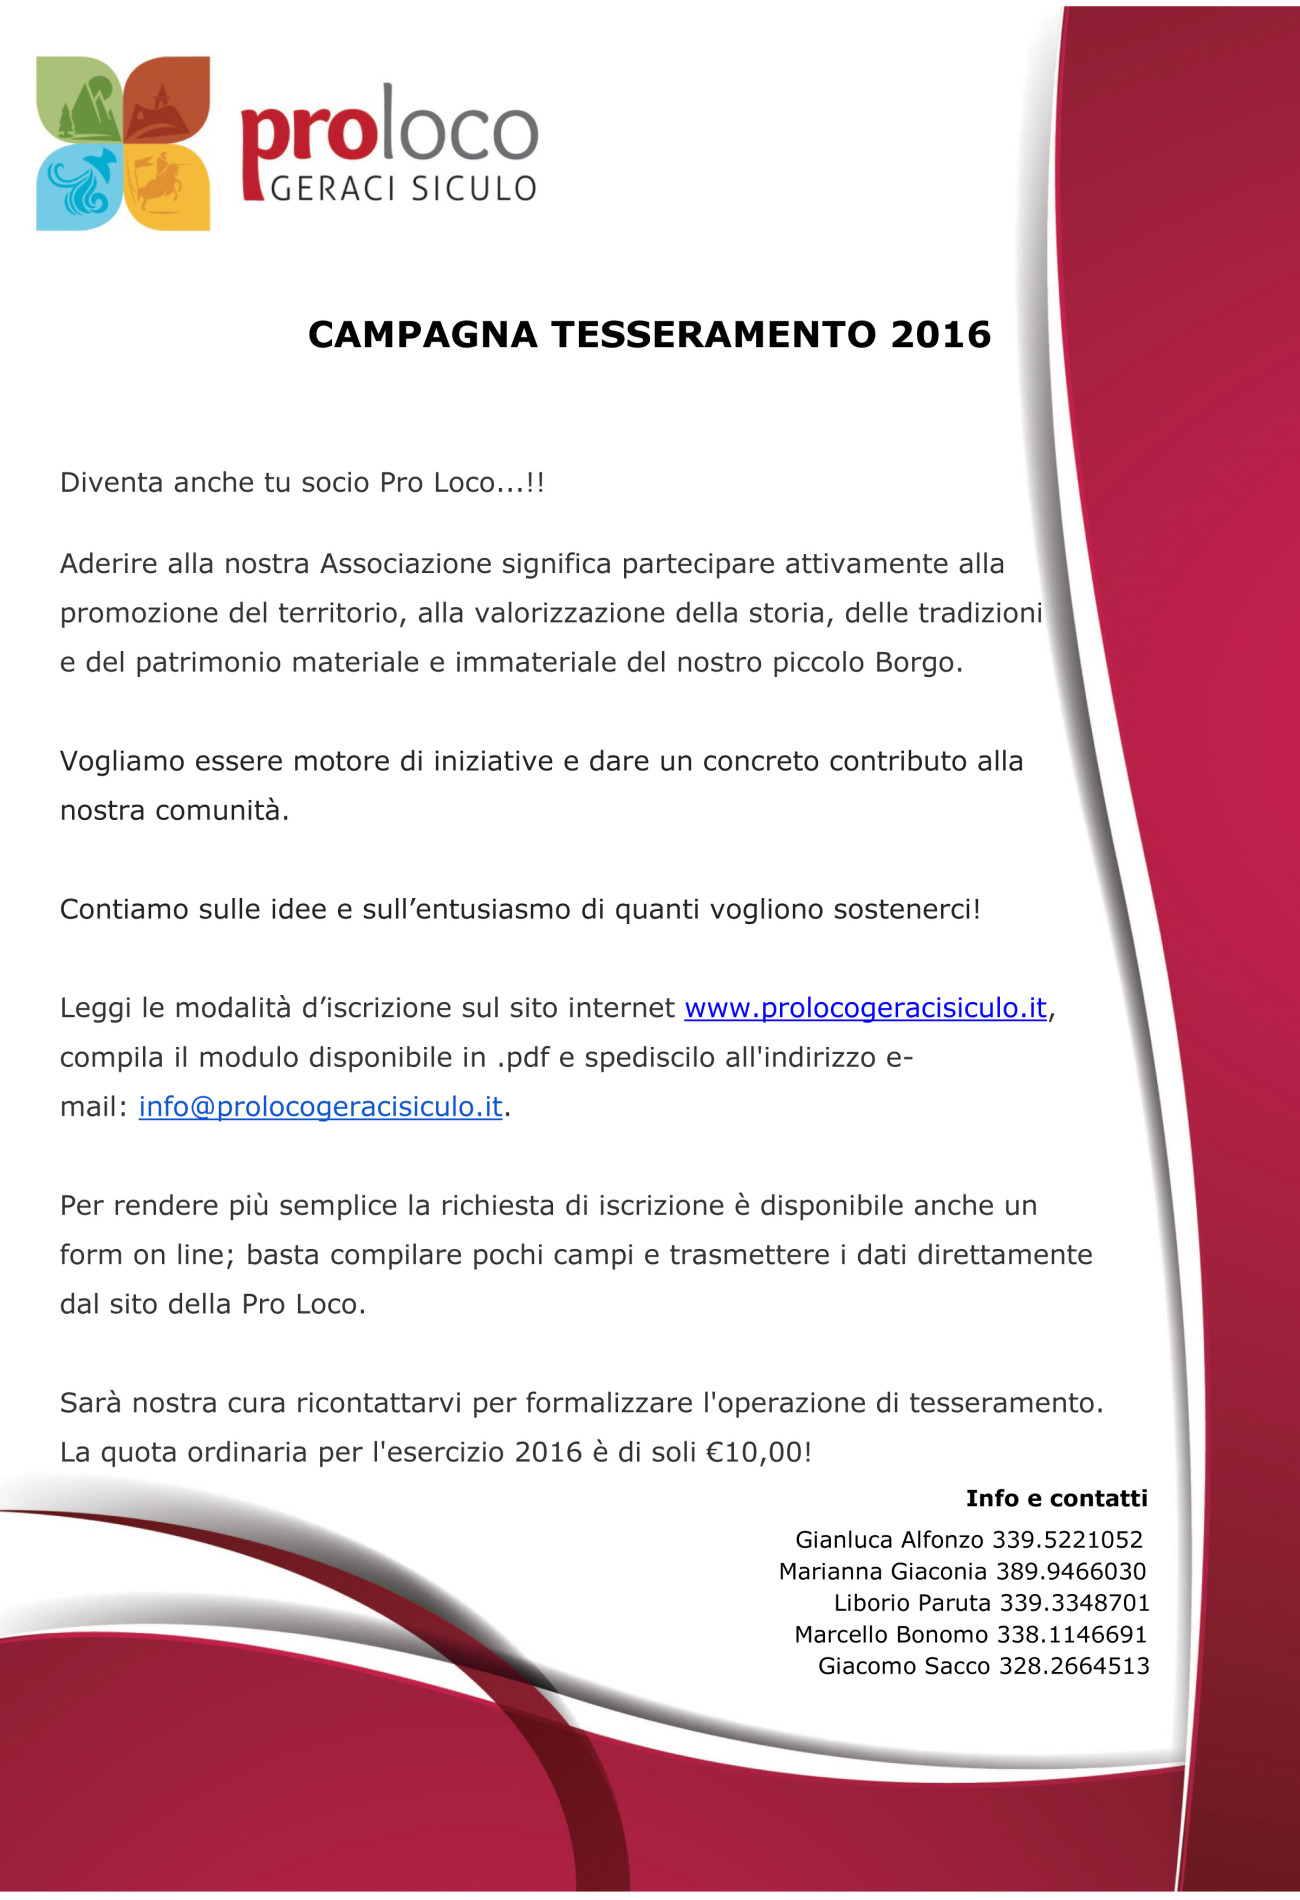 CAMPAGNA TESSERAMENTO 2016-01 (2)